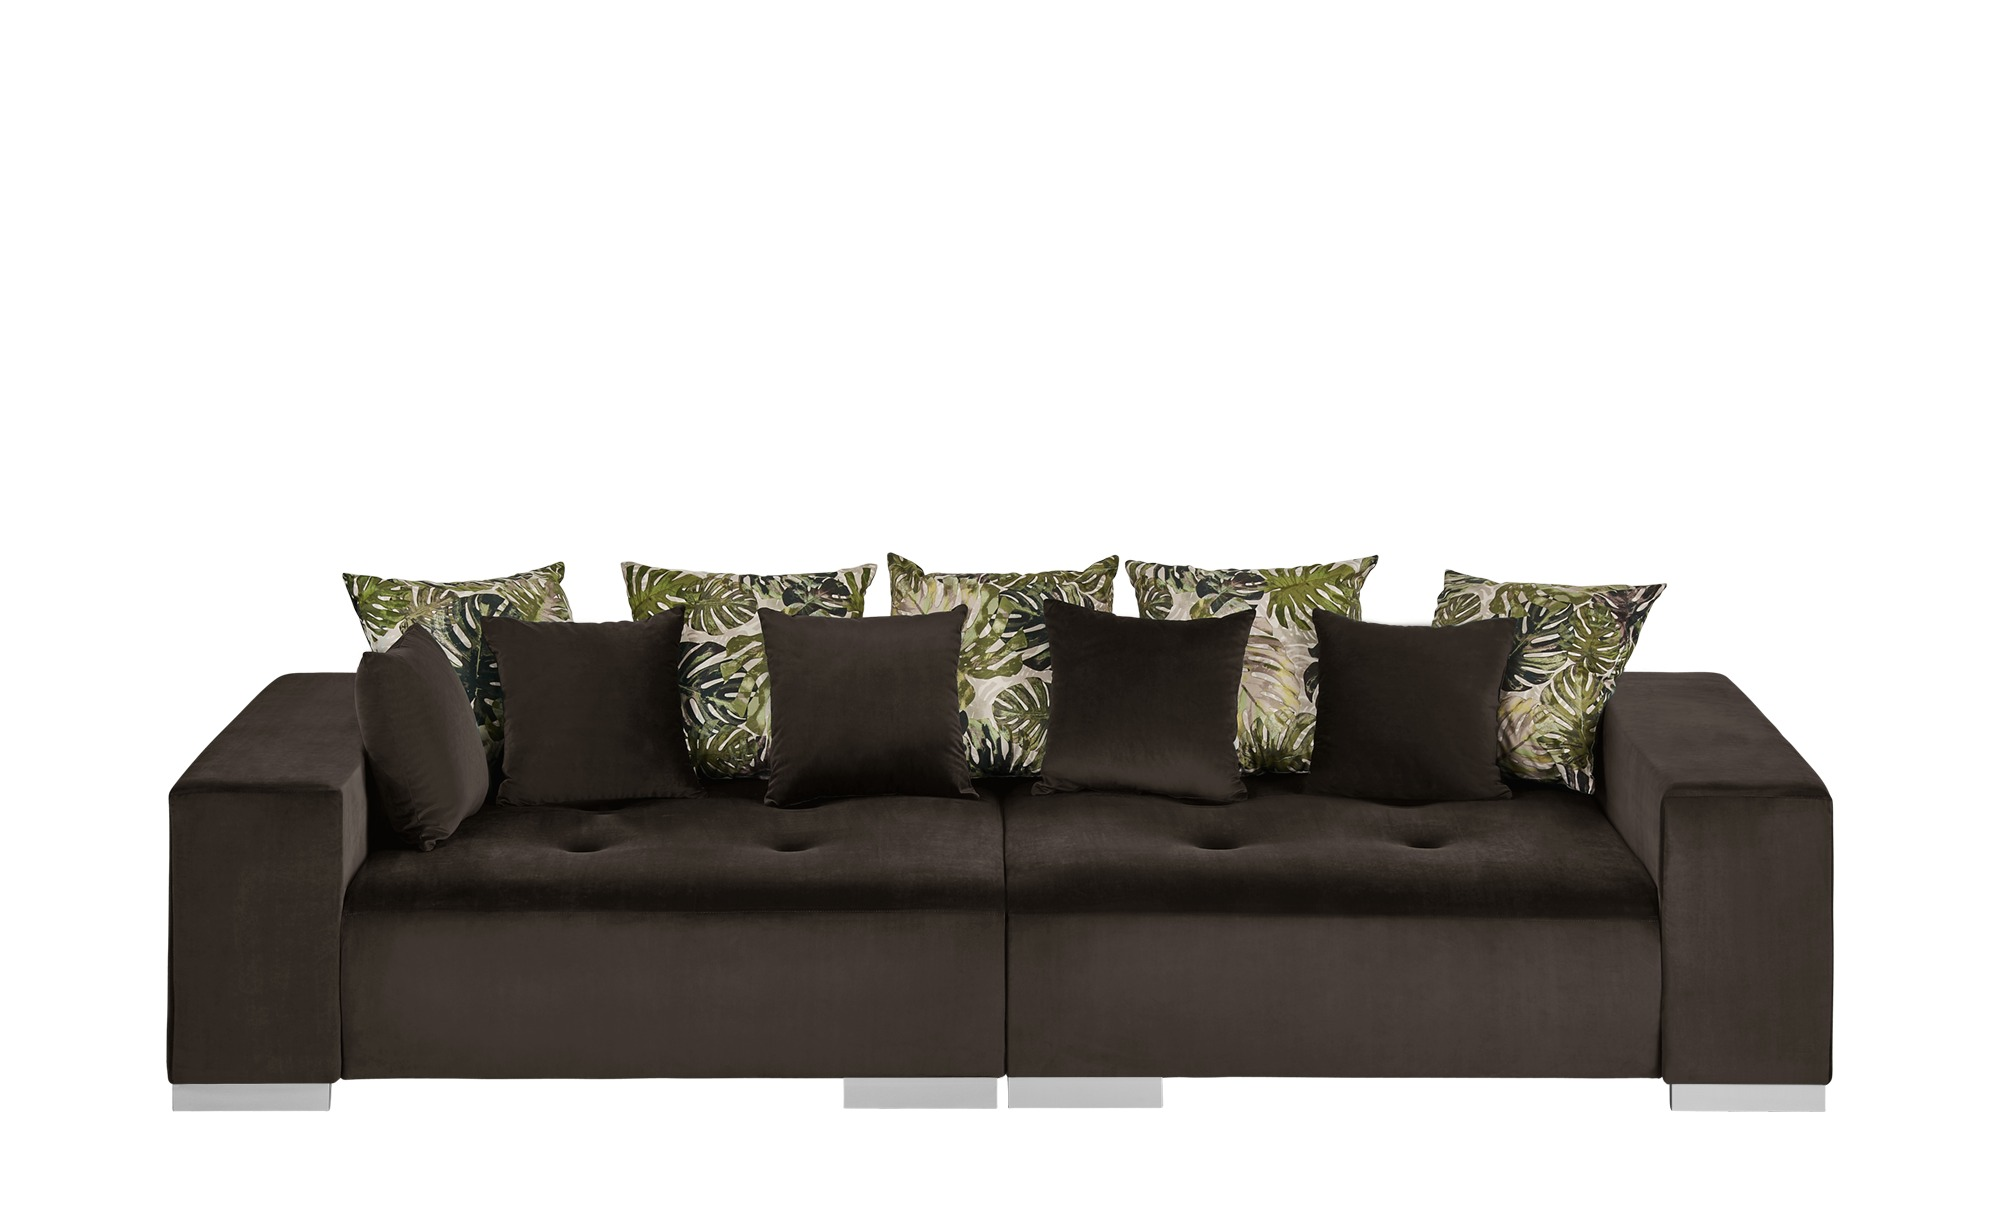 switch Big Sofa braun - Mikrofaser Kim ¦ braun ¦ Maße (cm): B: 300 H: 85 T: 136 Polstermöbel > Sofas > Big-Sofas - Höffner